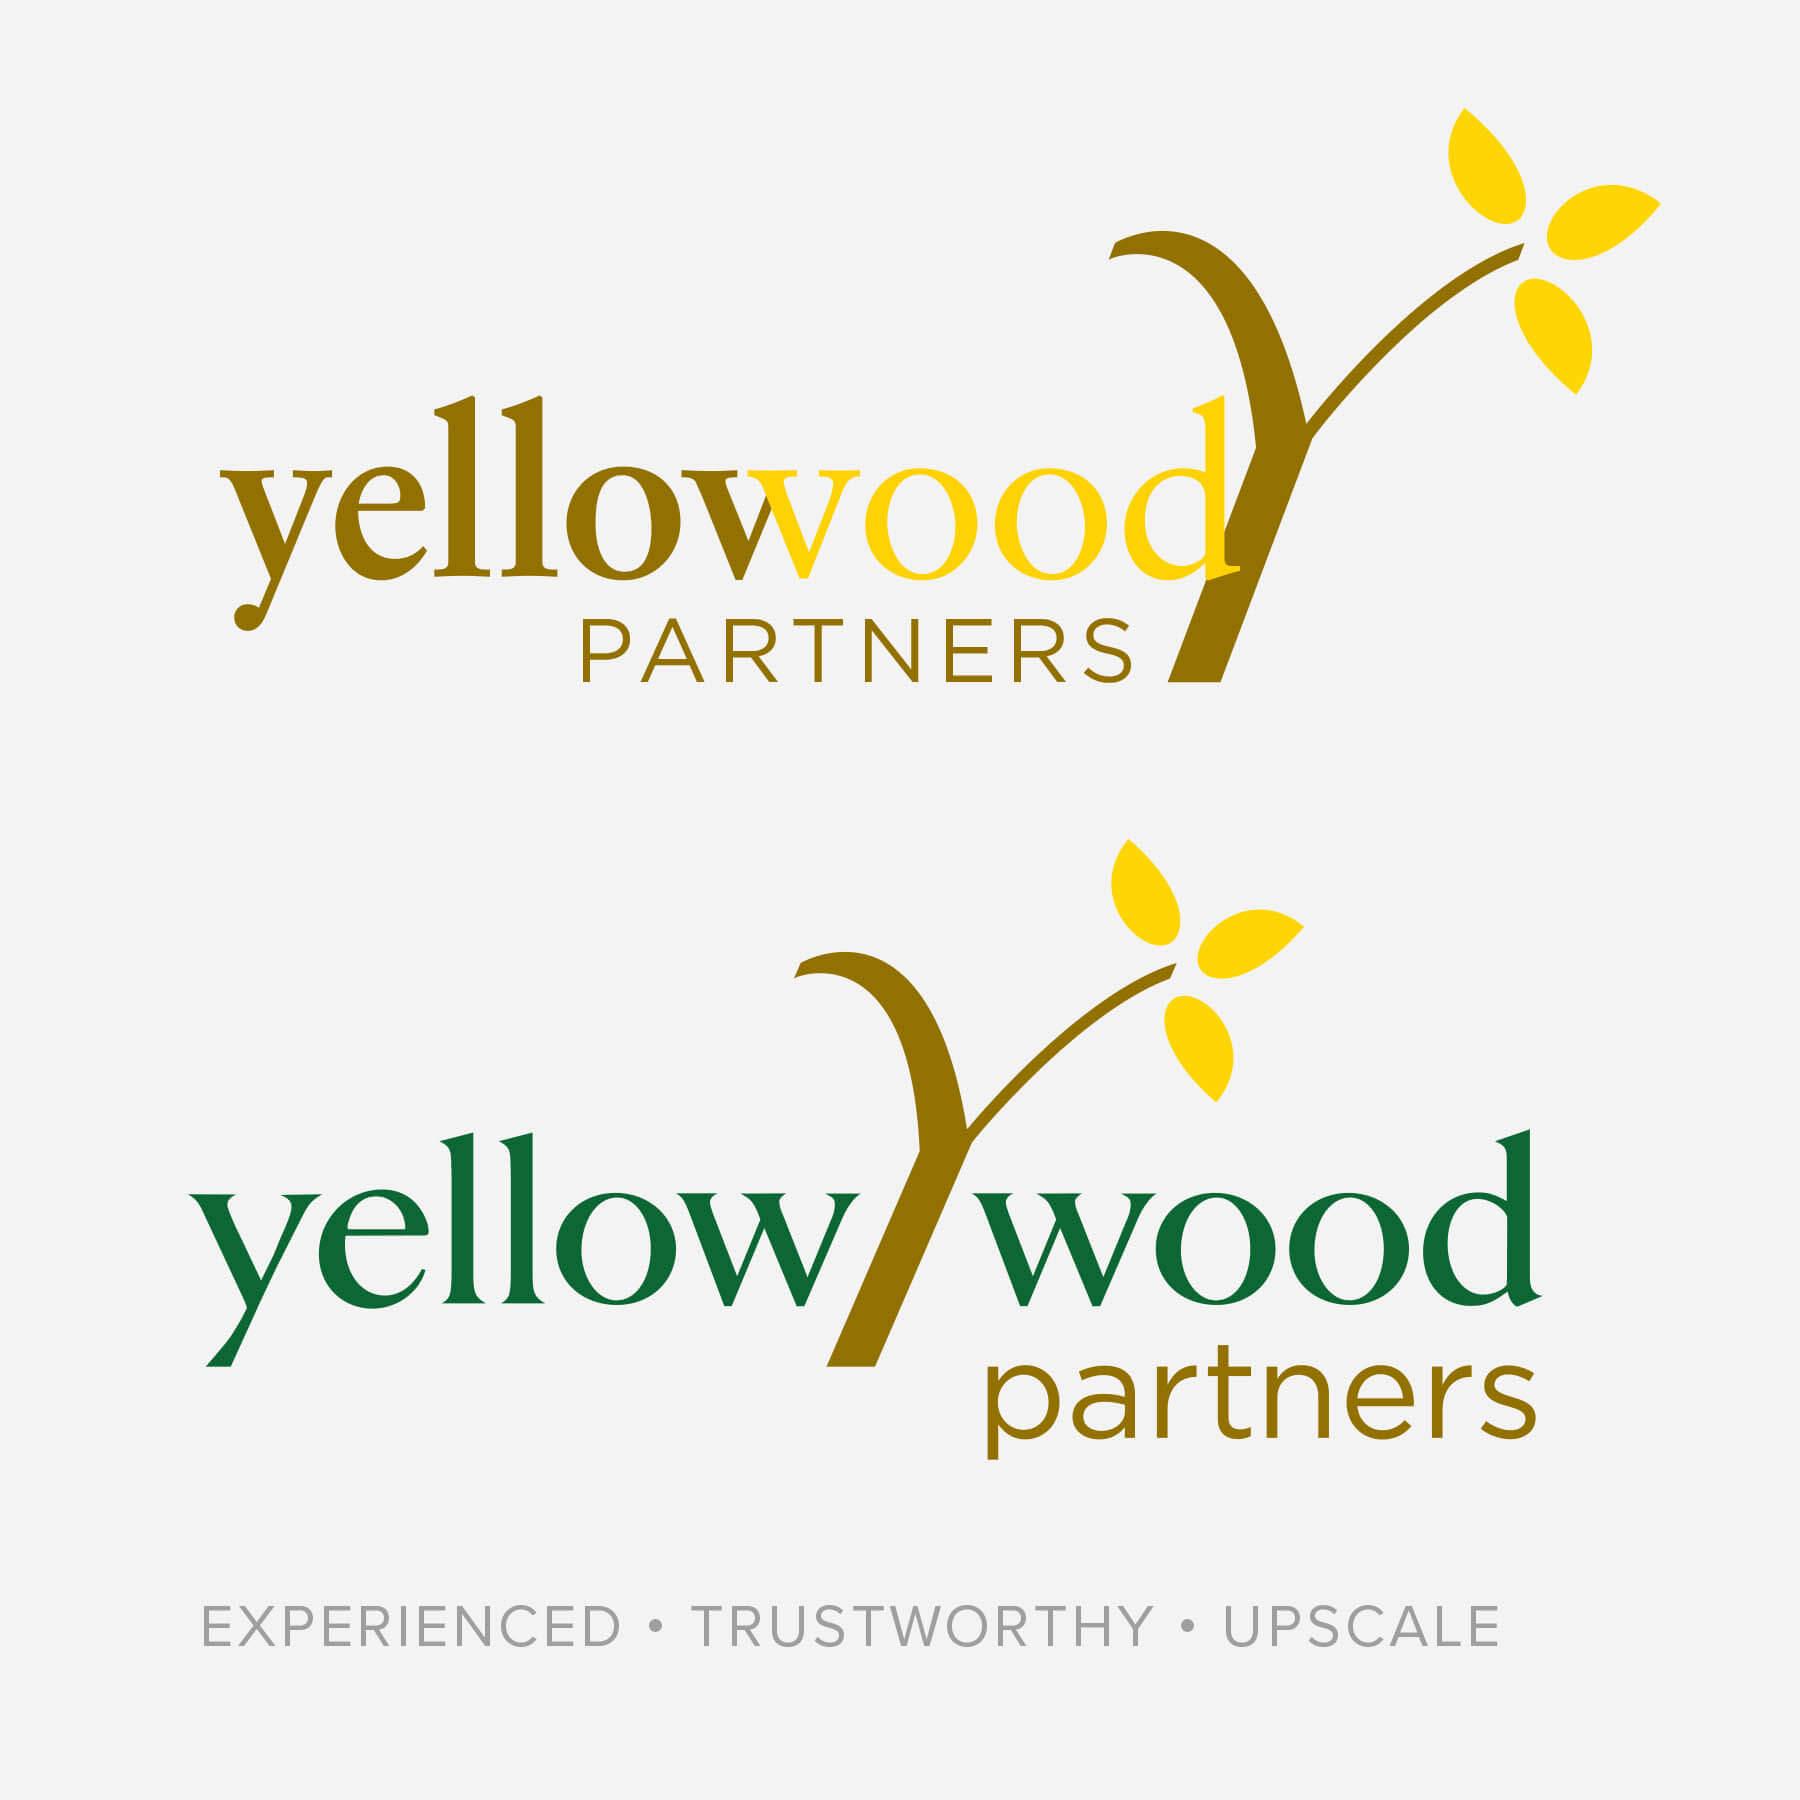 Yellow Wood Partners Serif Font Logo Options